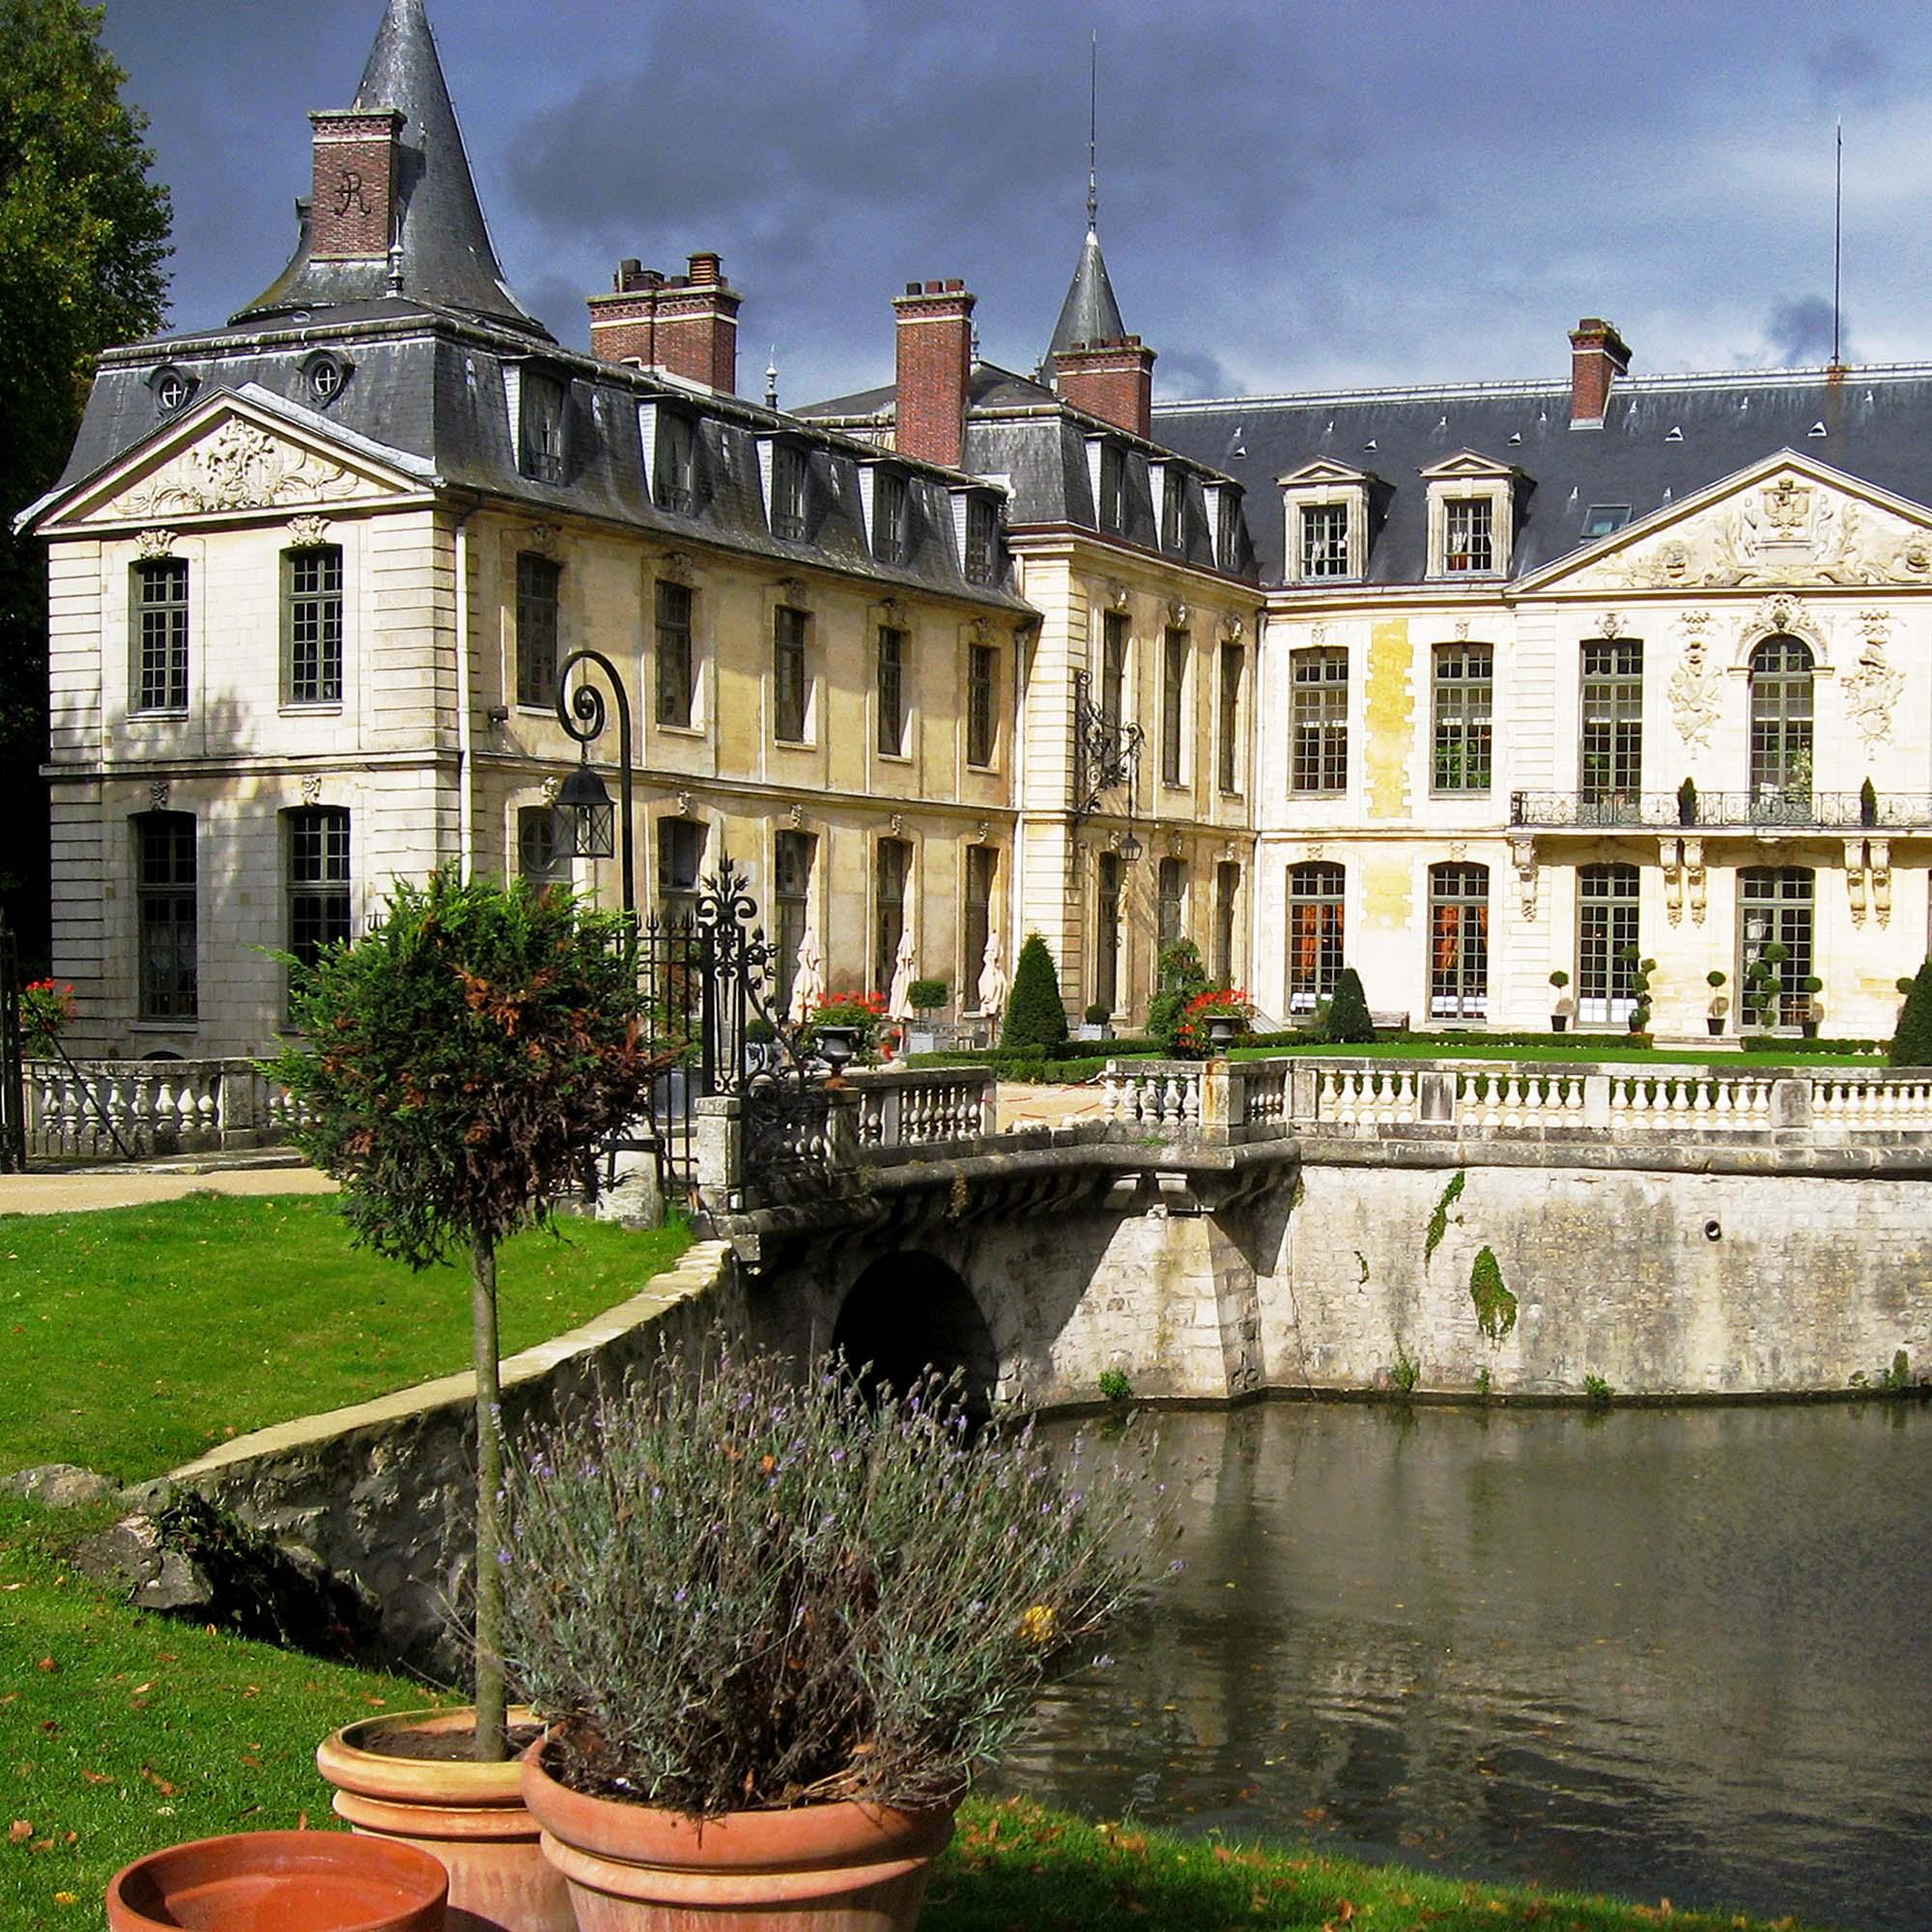 Chateau_Ermenonville_gîte_saint_germain_oise_versigny